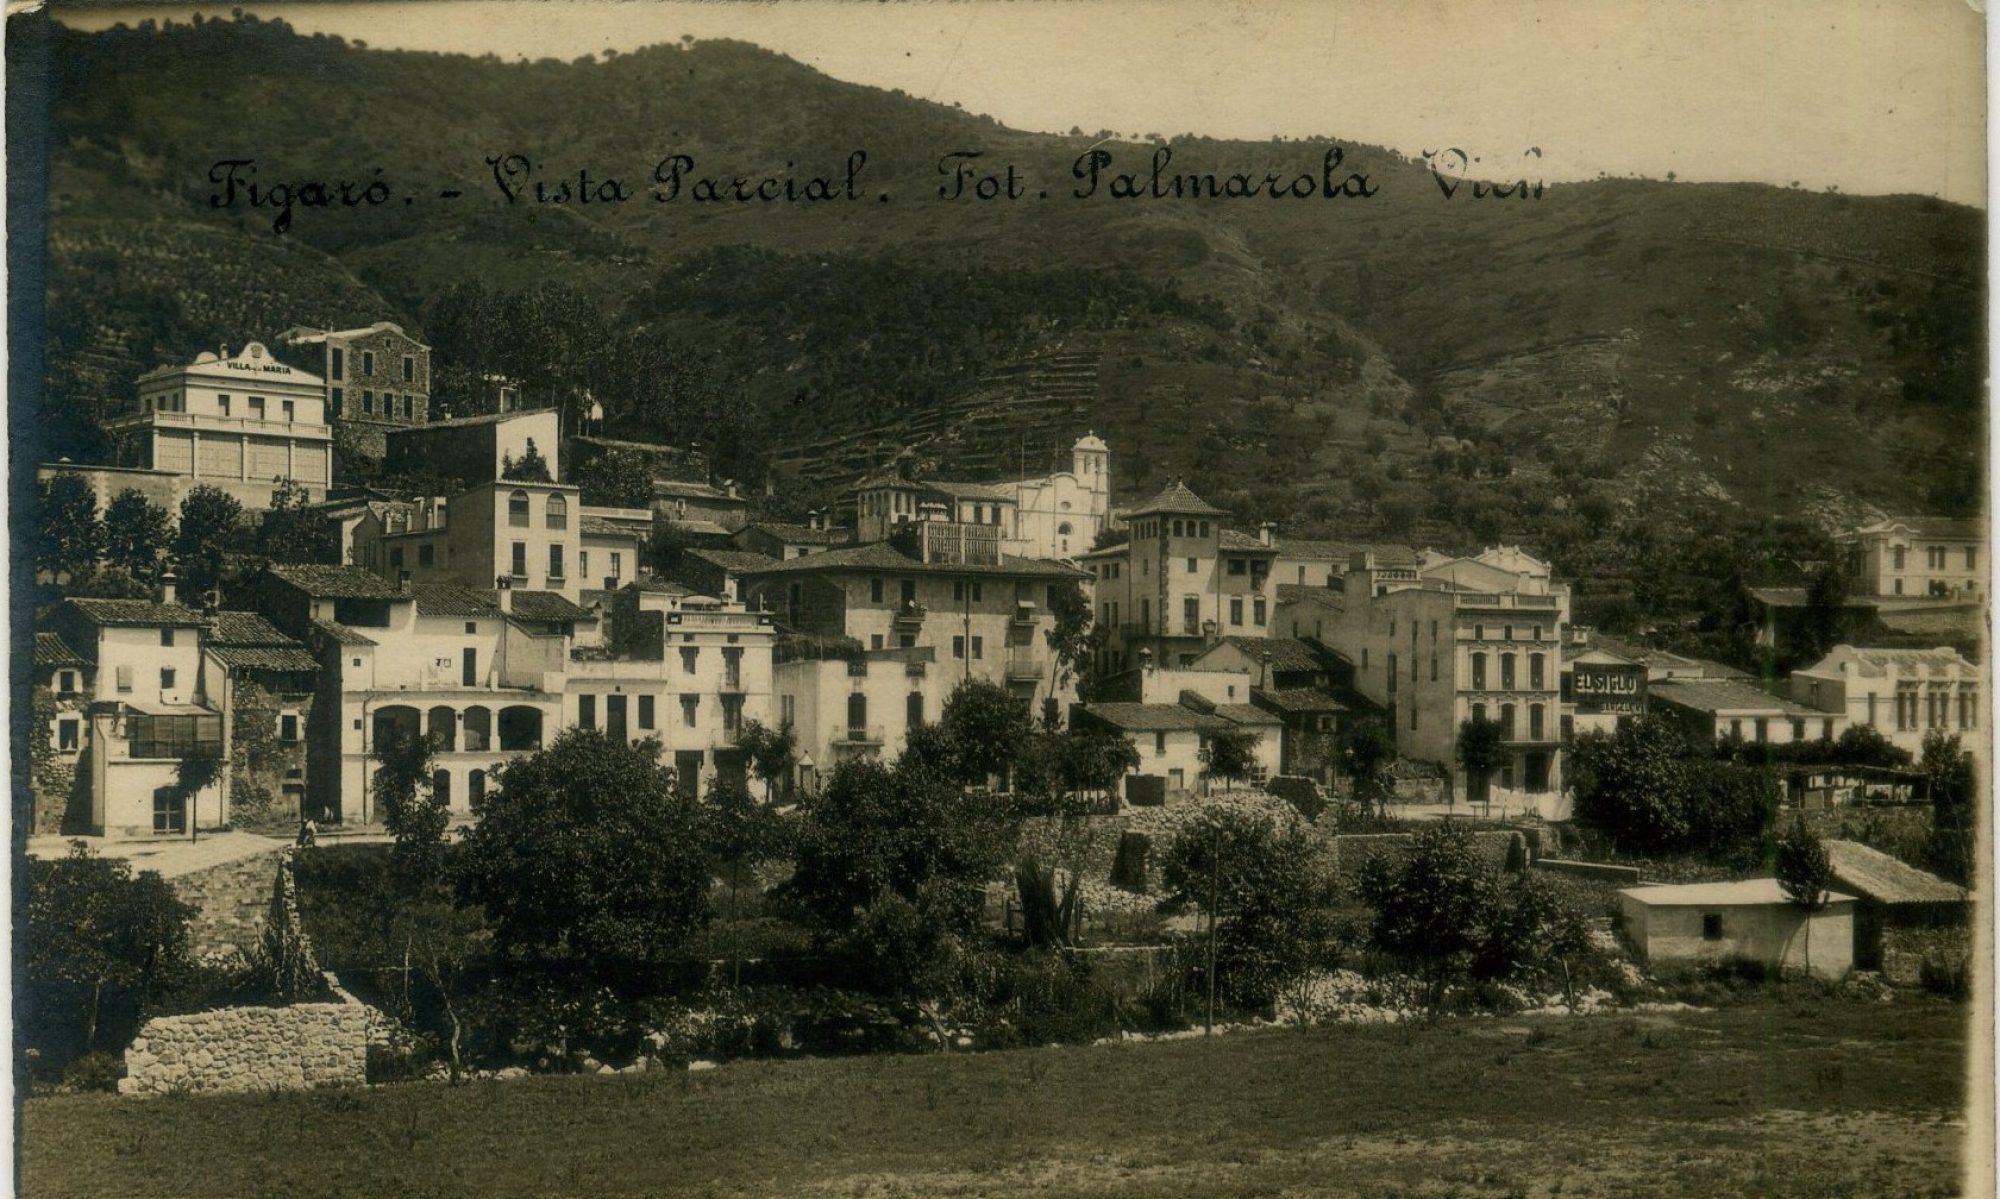 FIgaró memorial